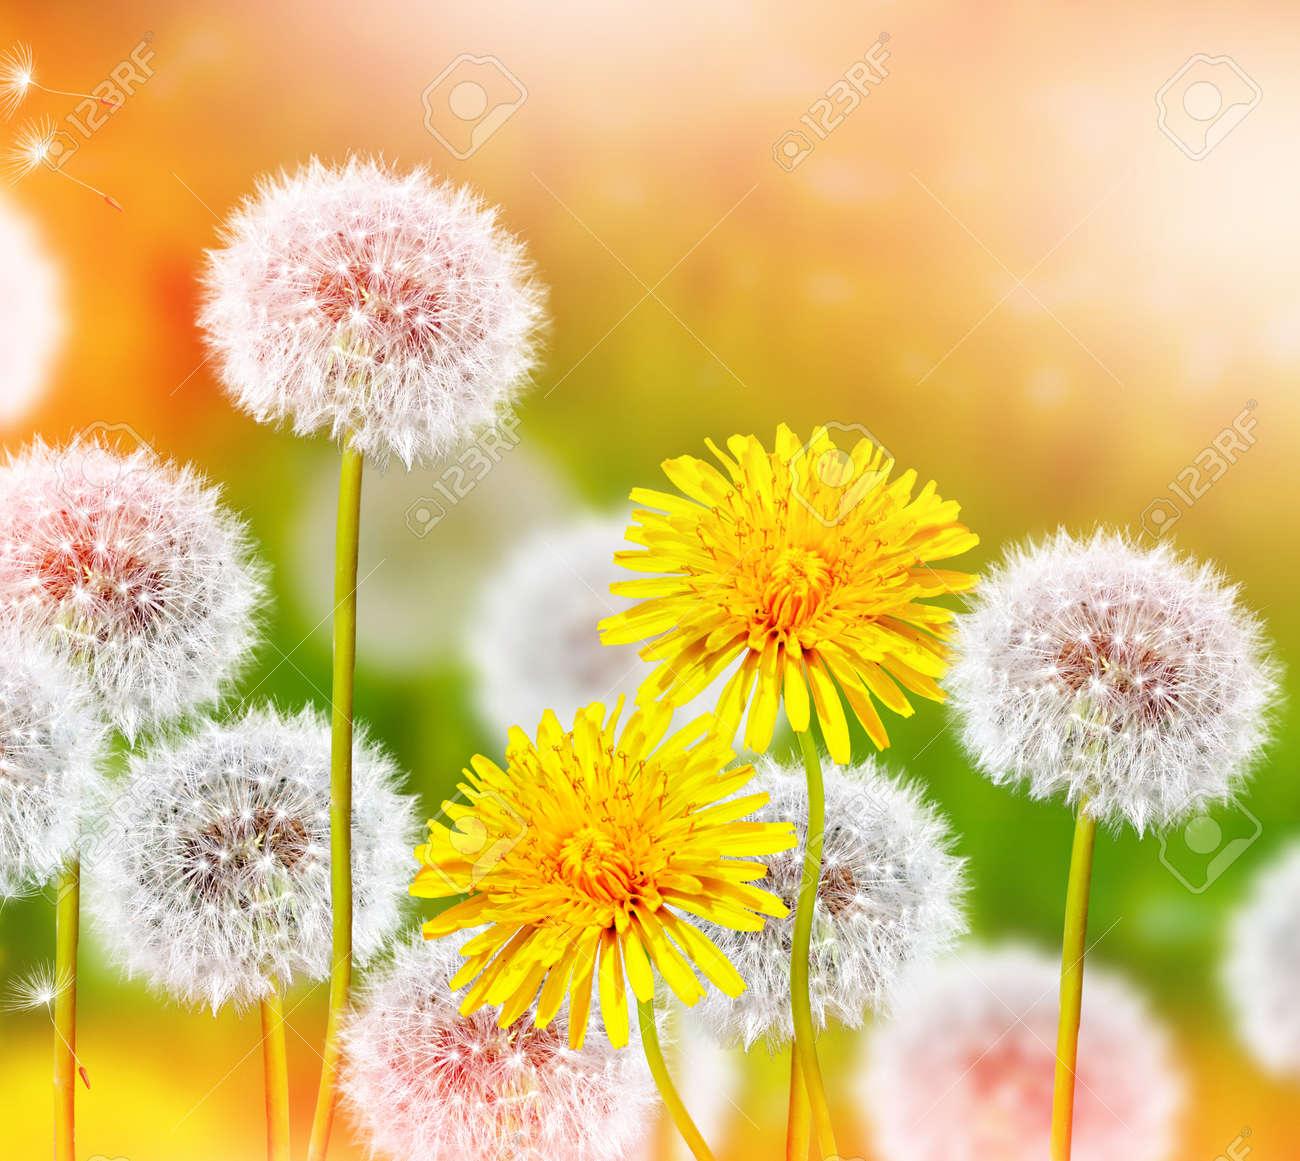 Flores Silvestres Dientes De Len Flores De Primavera Fotos